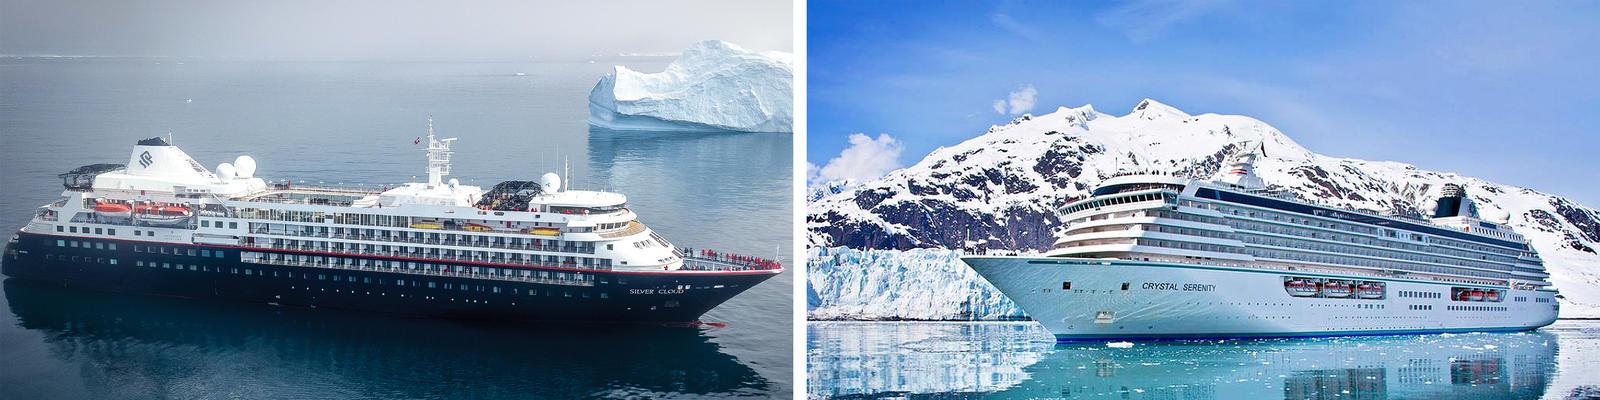 Silversea vs. Crystal Cruises (Photo: Silversea & Crystal)